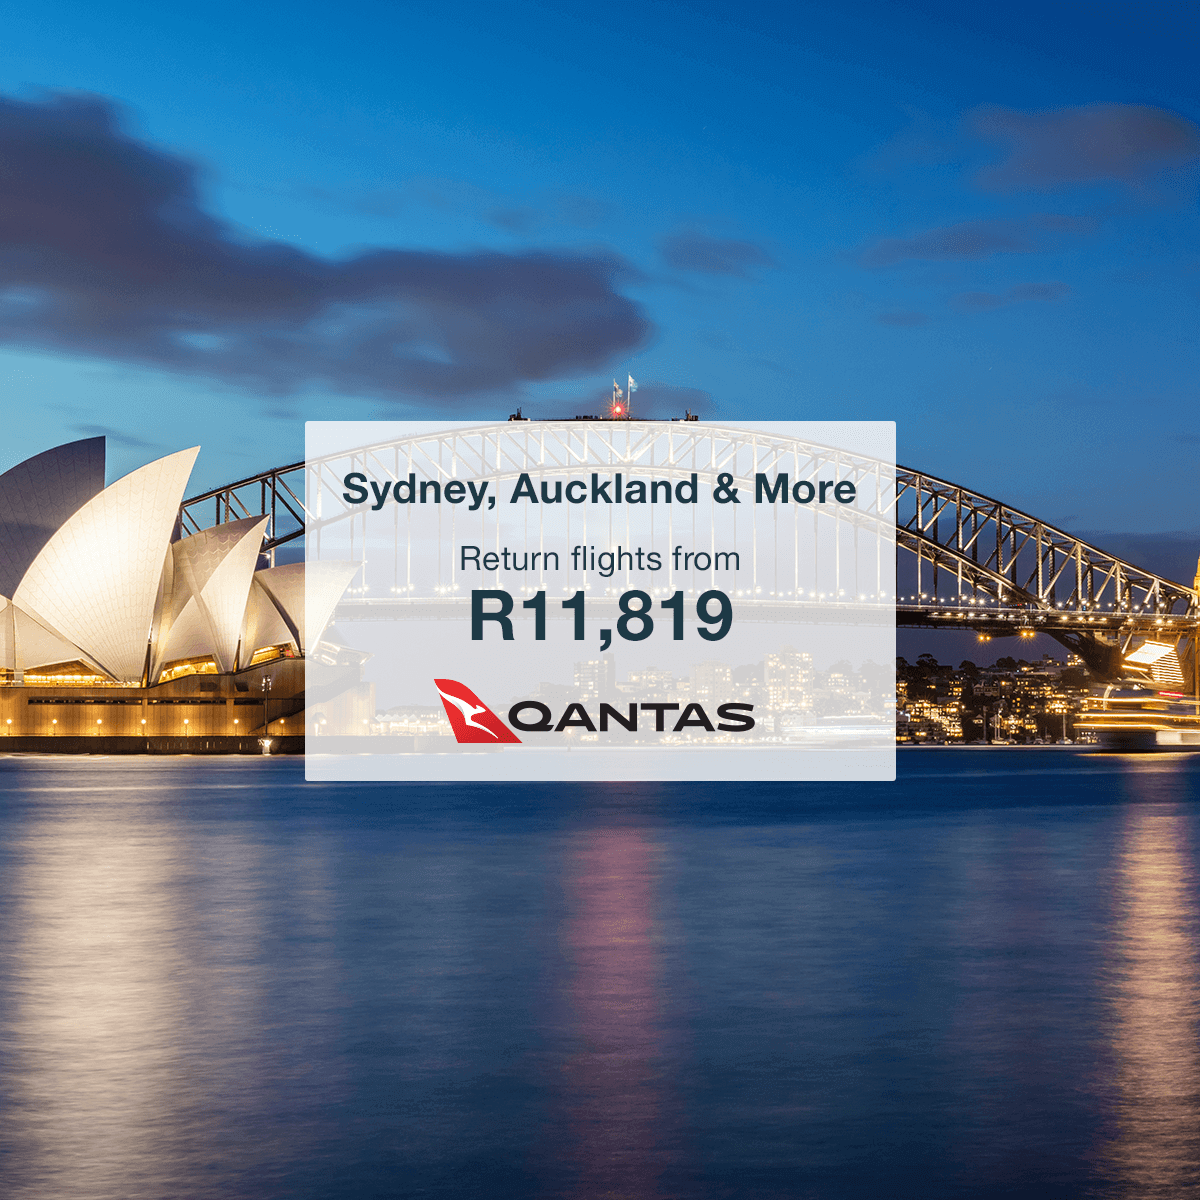 Cheap Qantas Flights to Australia & New Zealand